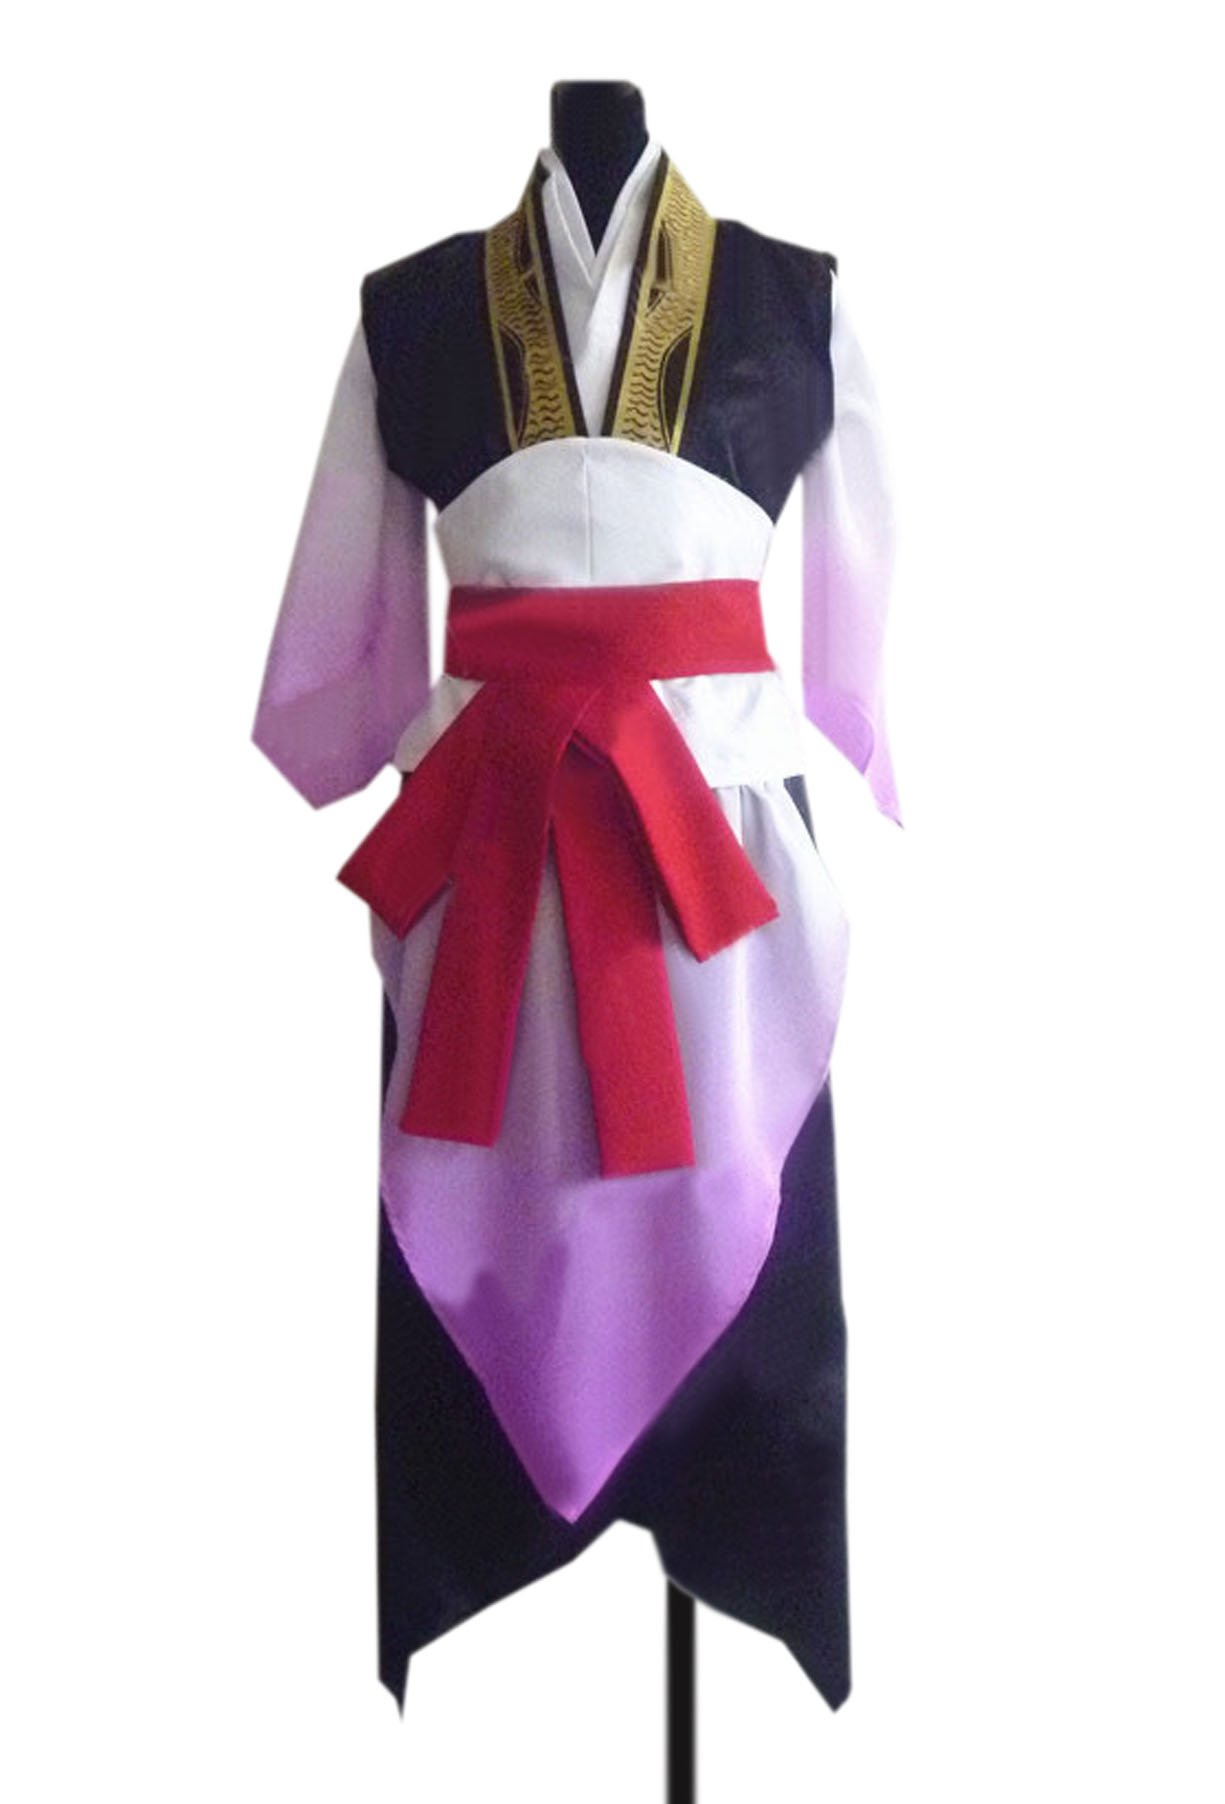 Dreamcosplay Anime Magi: The Labyrinth of Magic Hakuryuu Ren Cosplay Costume